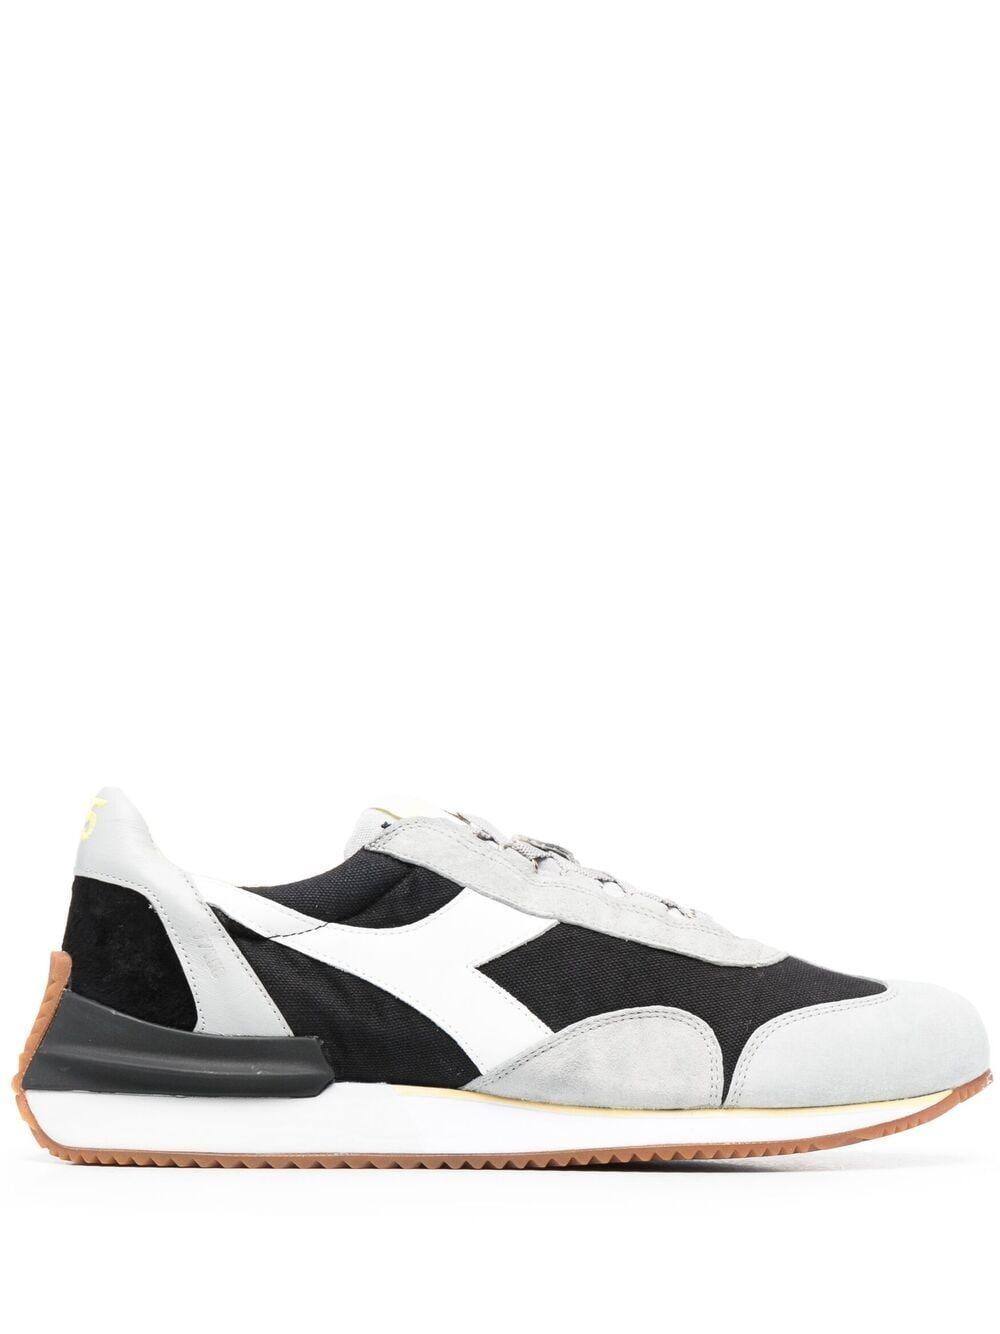 Diadora equipe mad man black DIADORA | Sneakers | 201.177158C1041